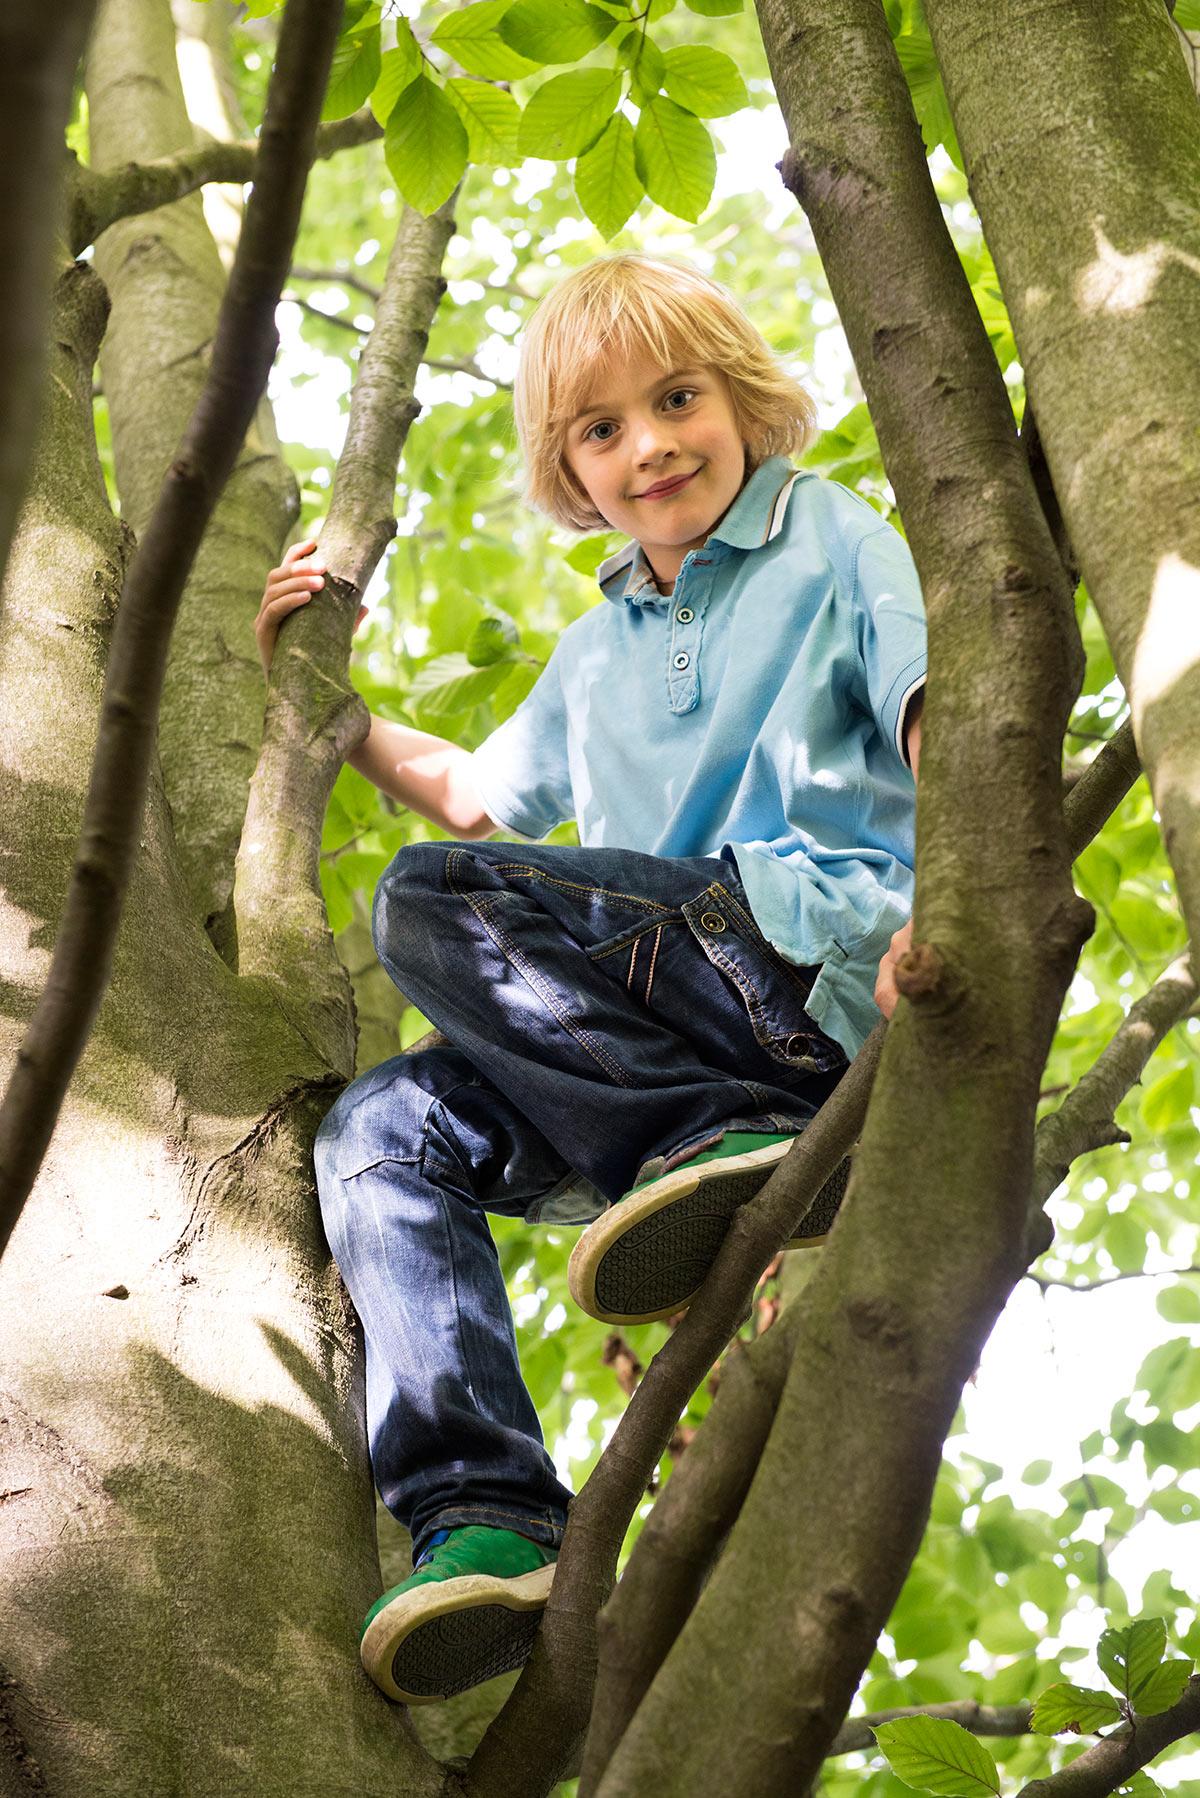 Familienfotografie Honeylight : Junge klettert im Baum